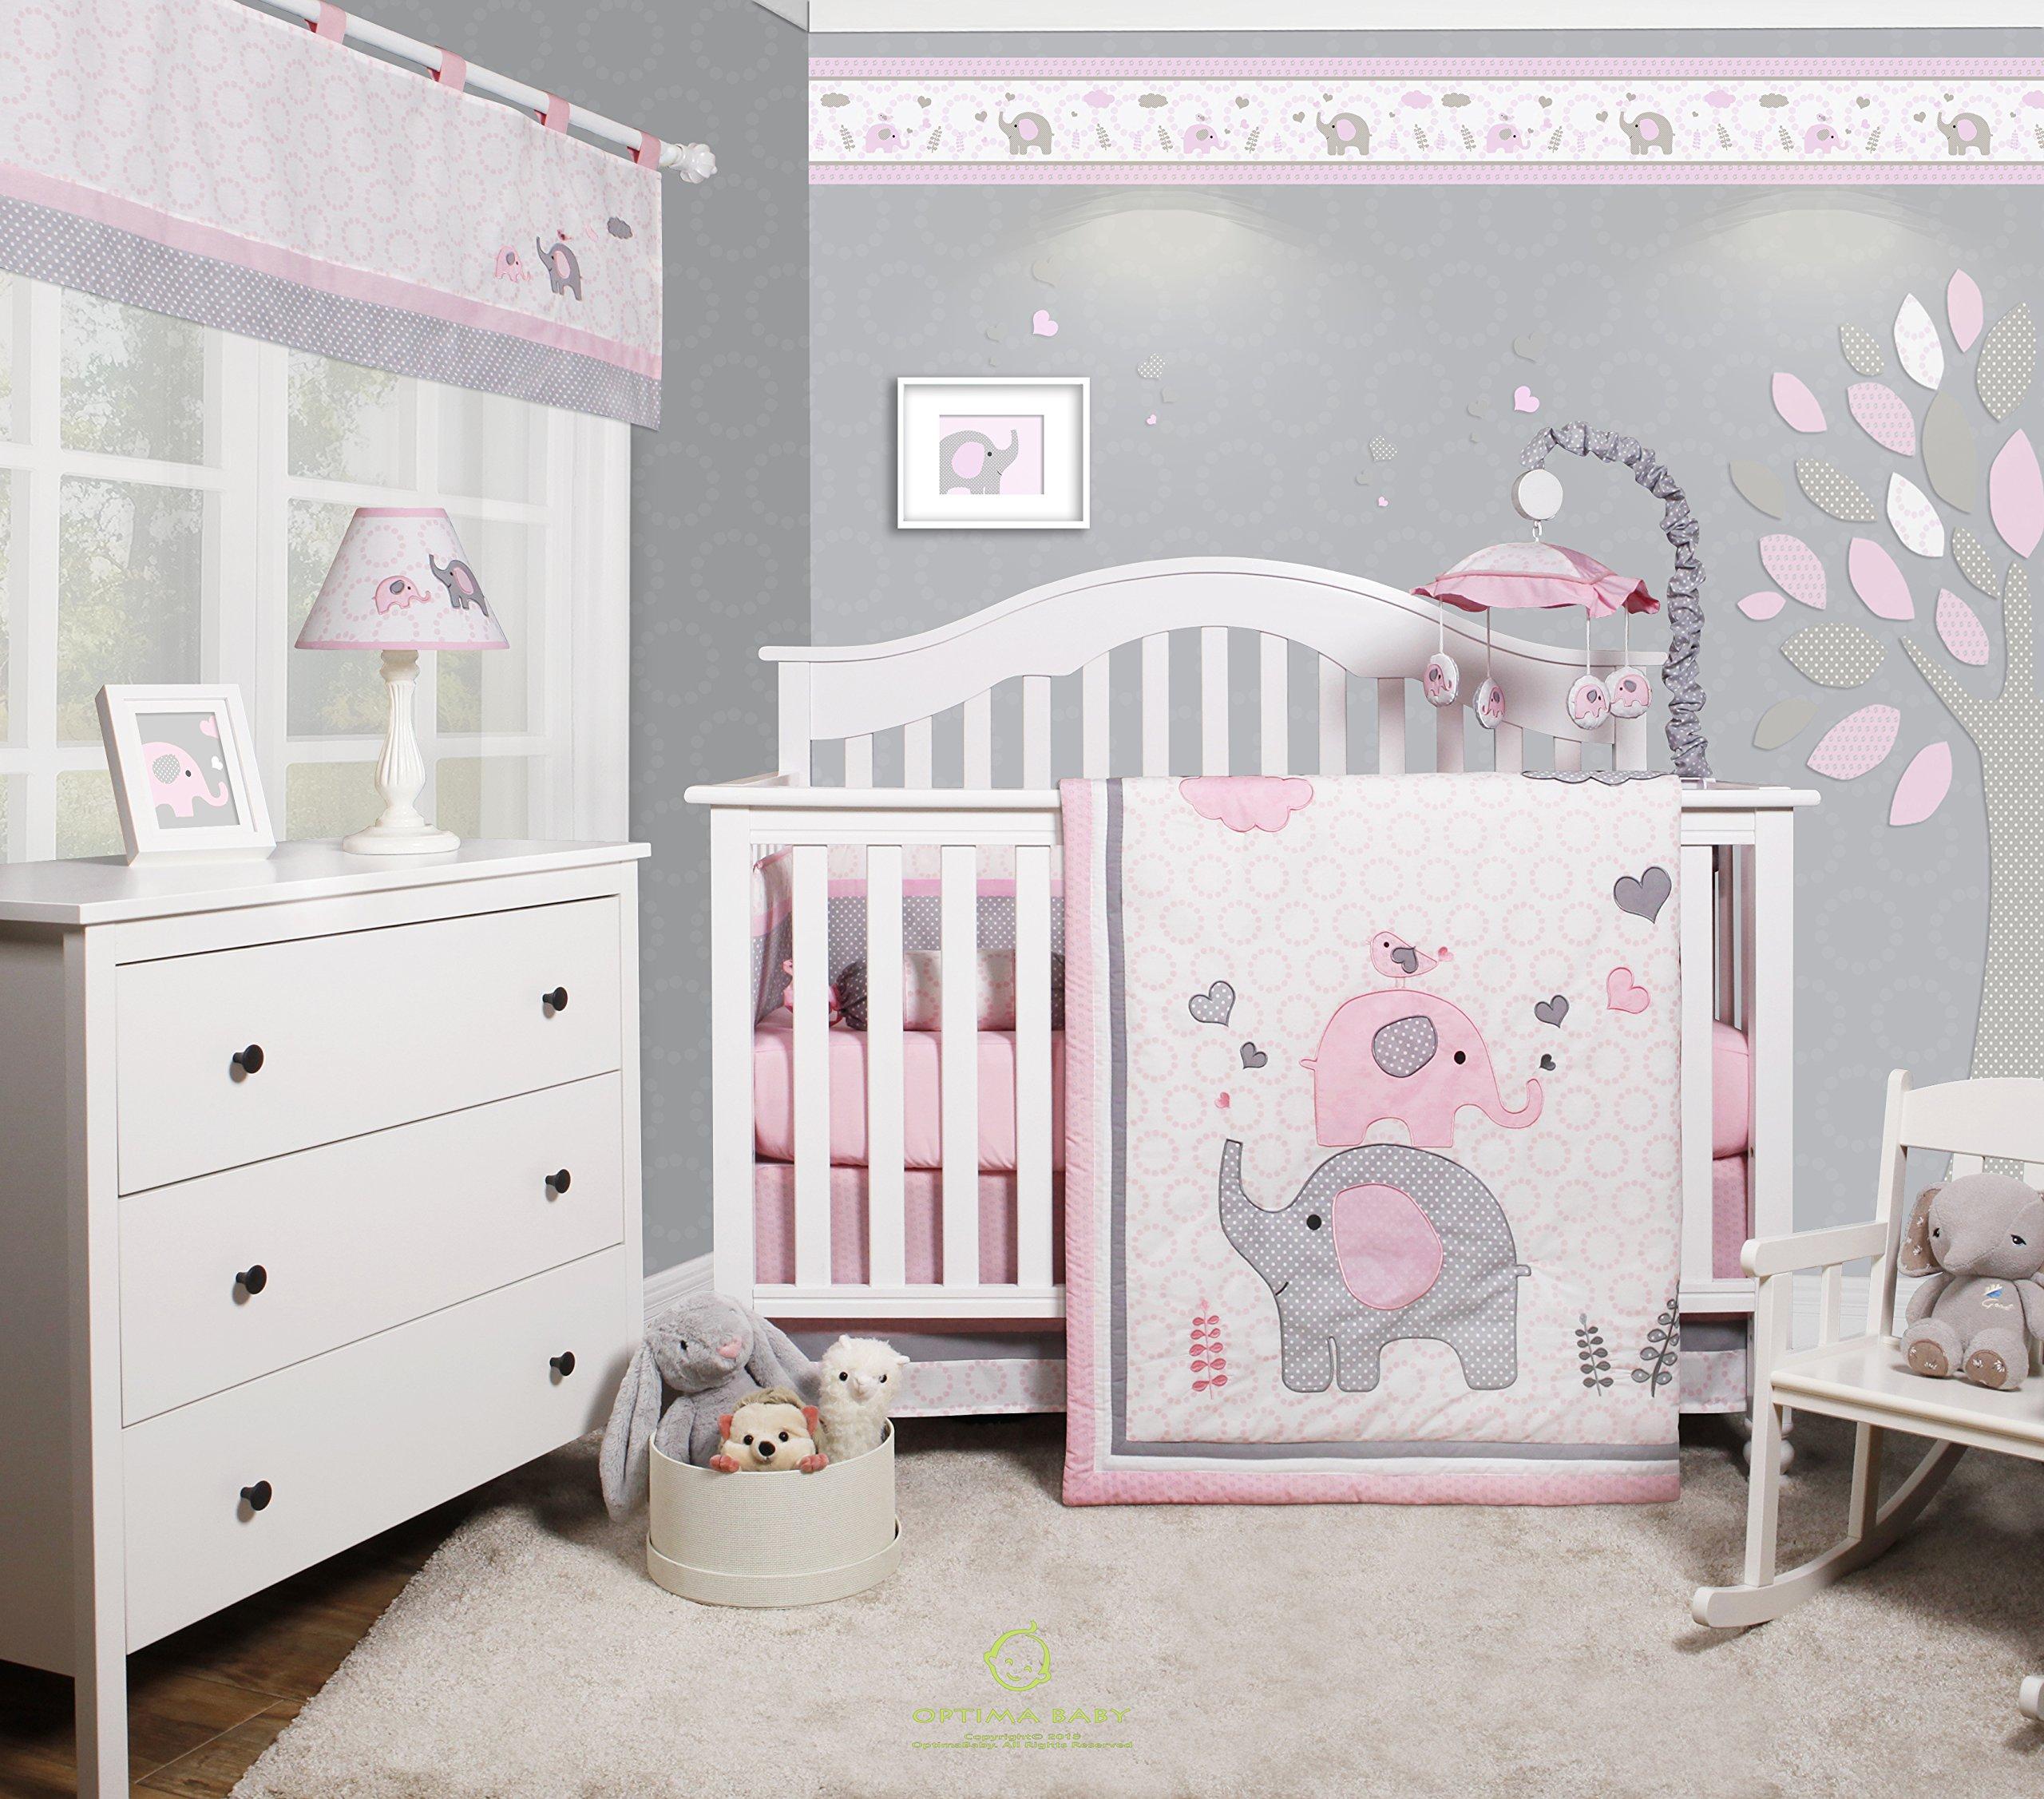 GEENNY OptimaBaby Pink Grey Elephant 6 Piece Baby Girl Nursery Crib Bedding Set by GEENNY